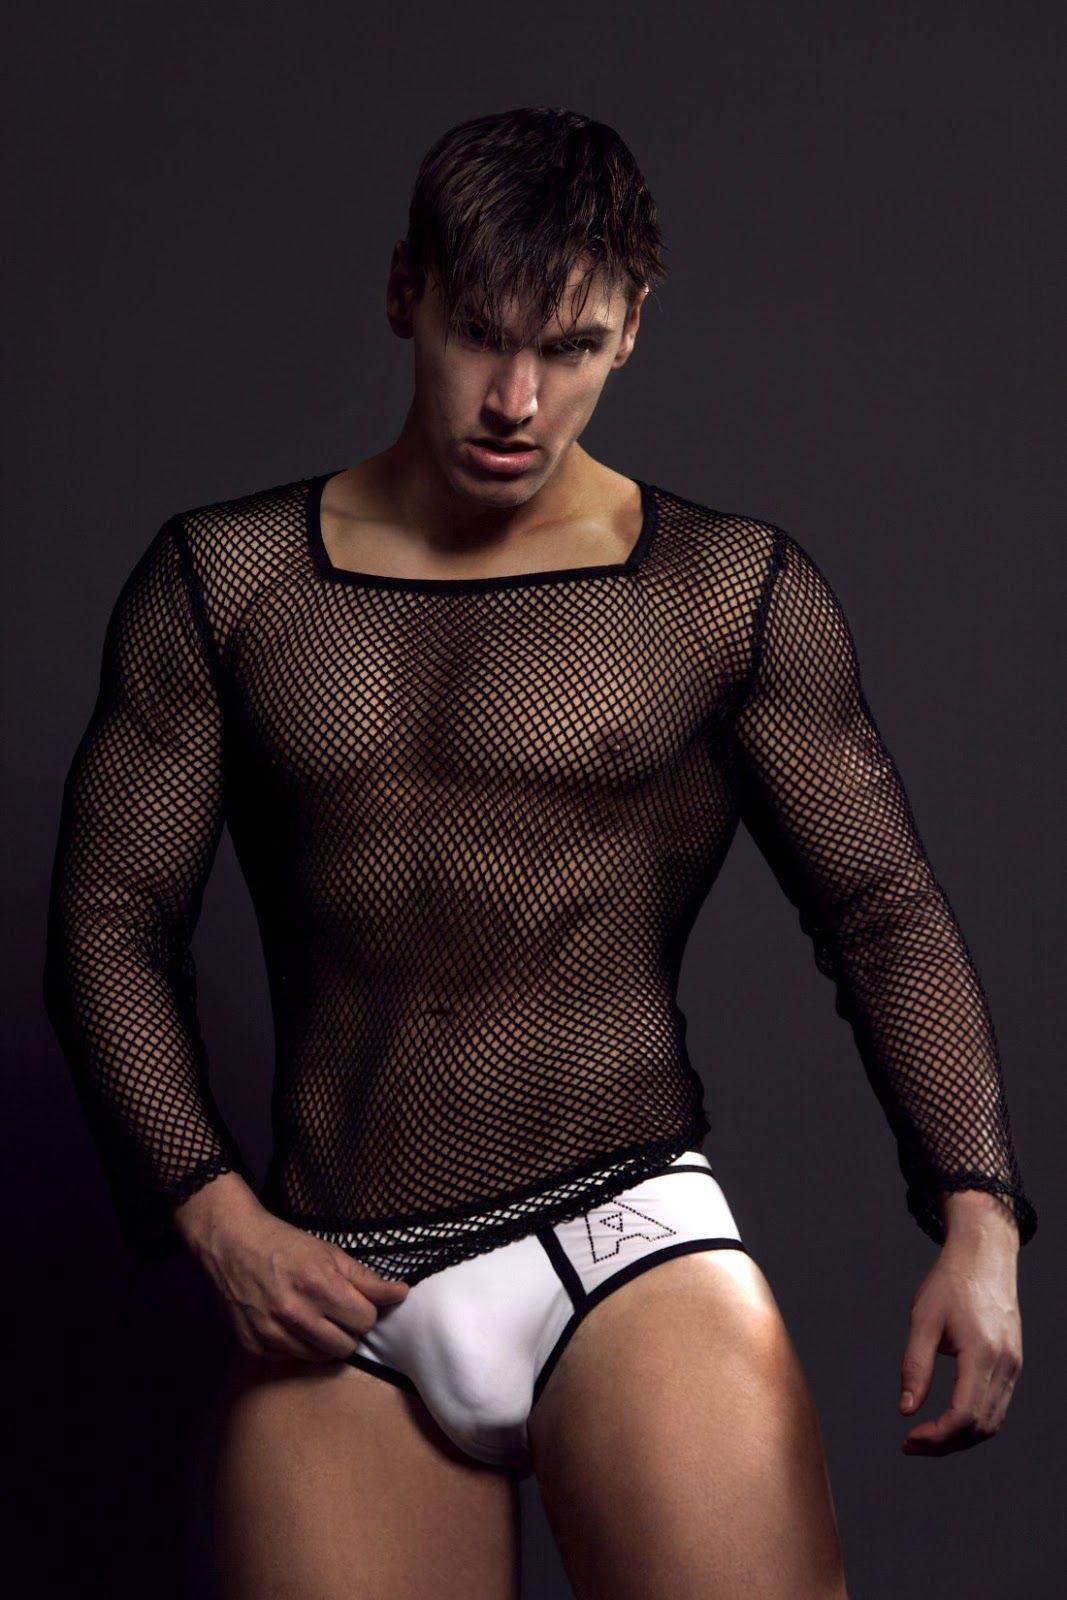 Sexy men's clothing